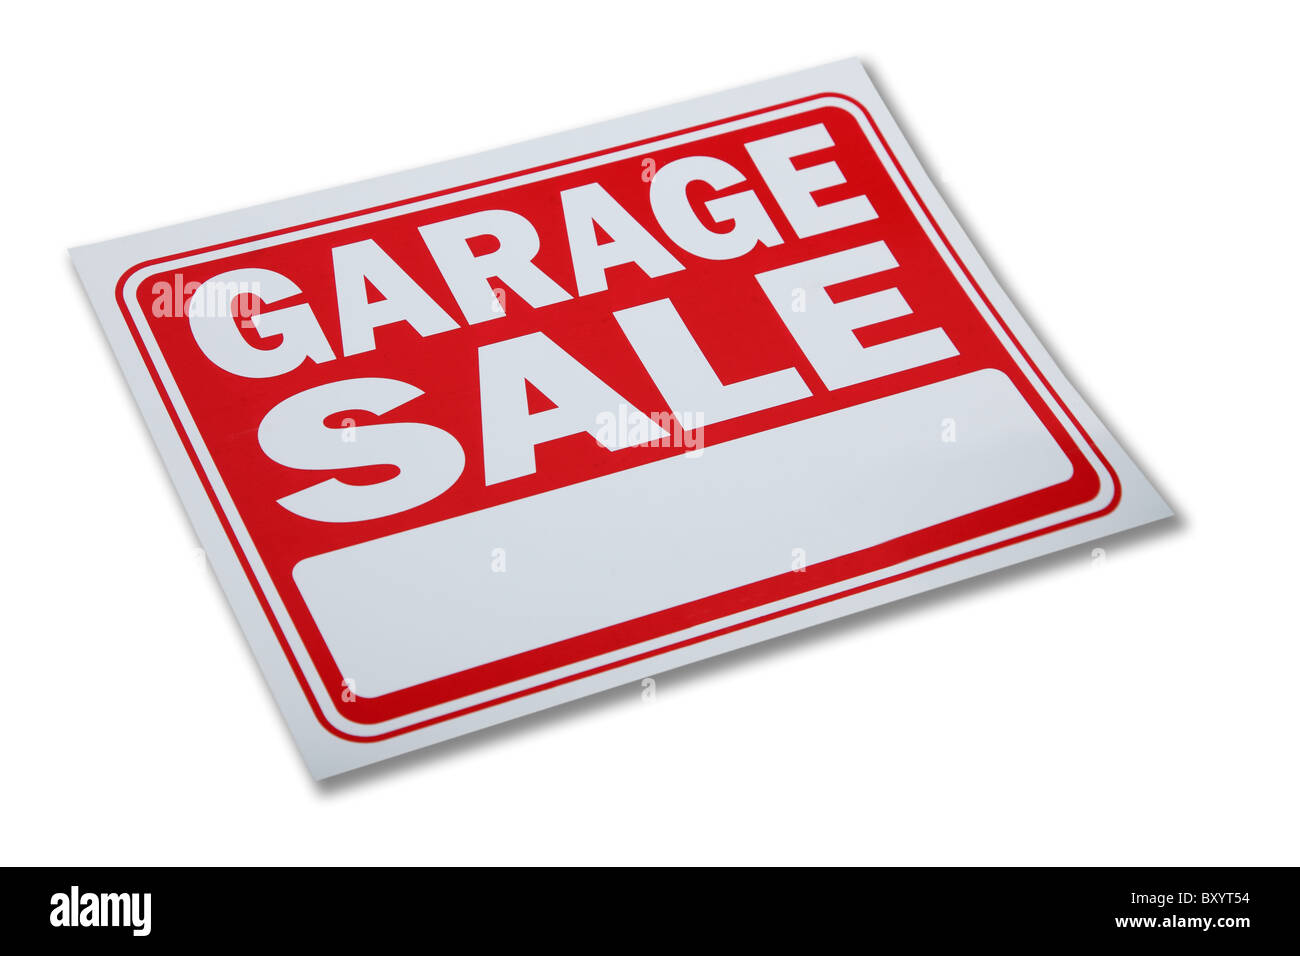 Garage sale sign on white background - Stock Image